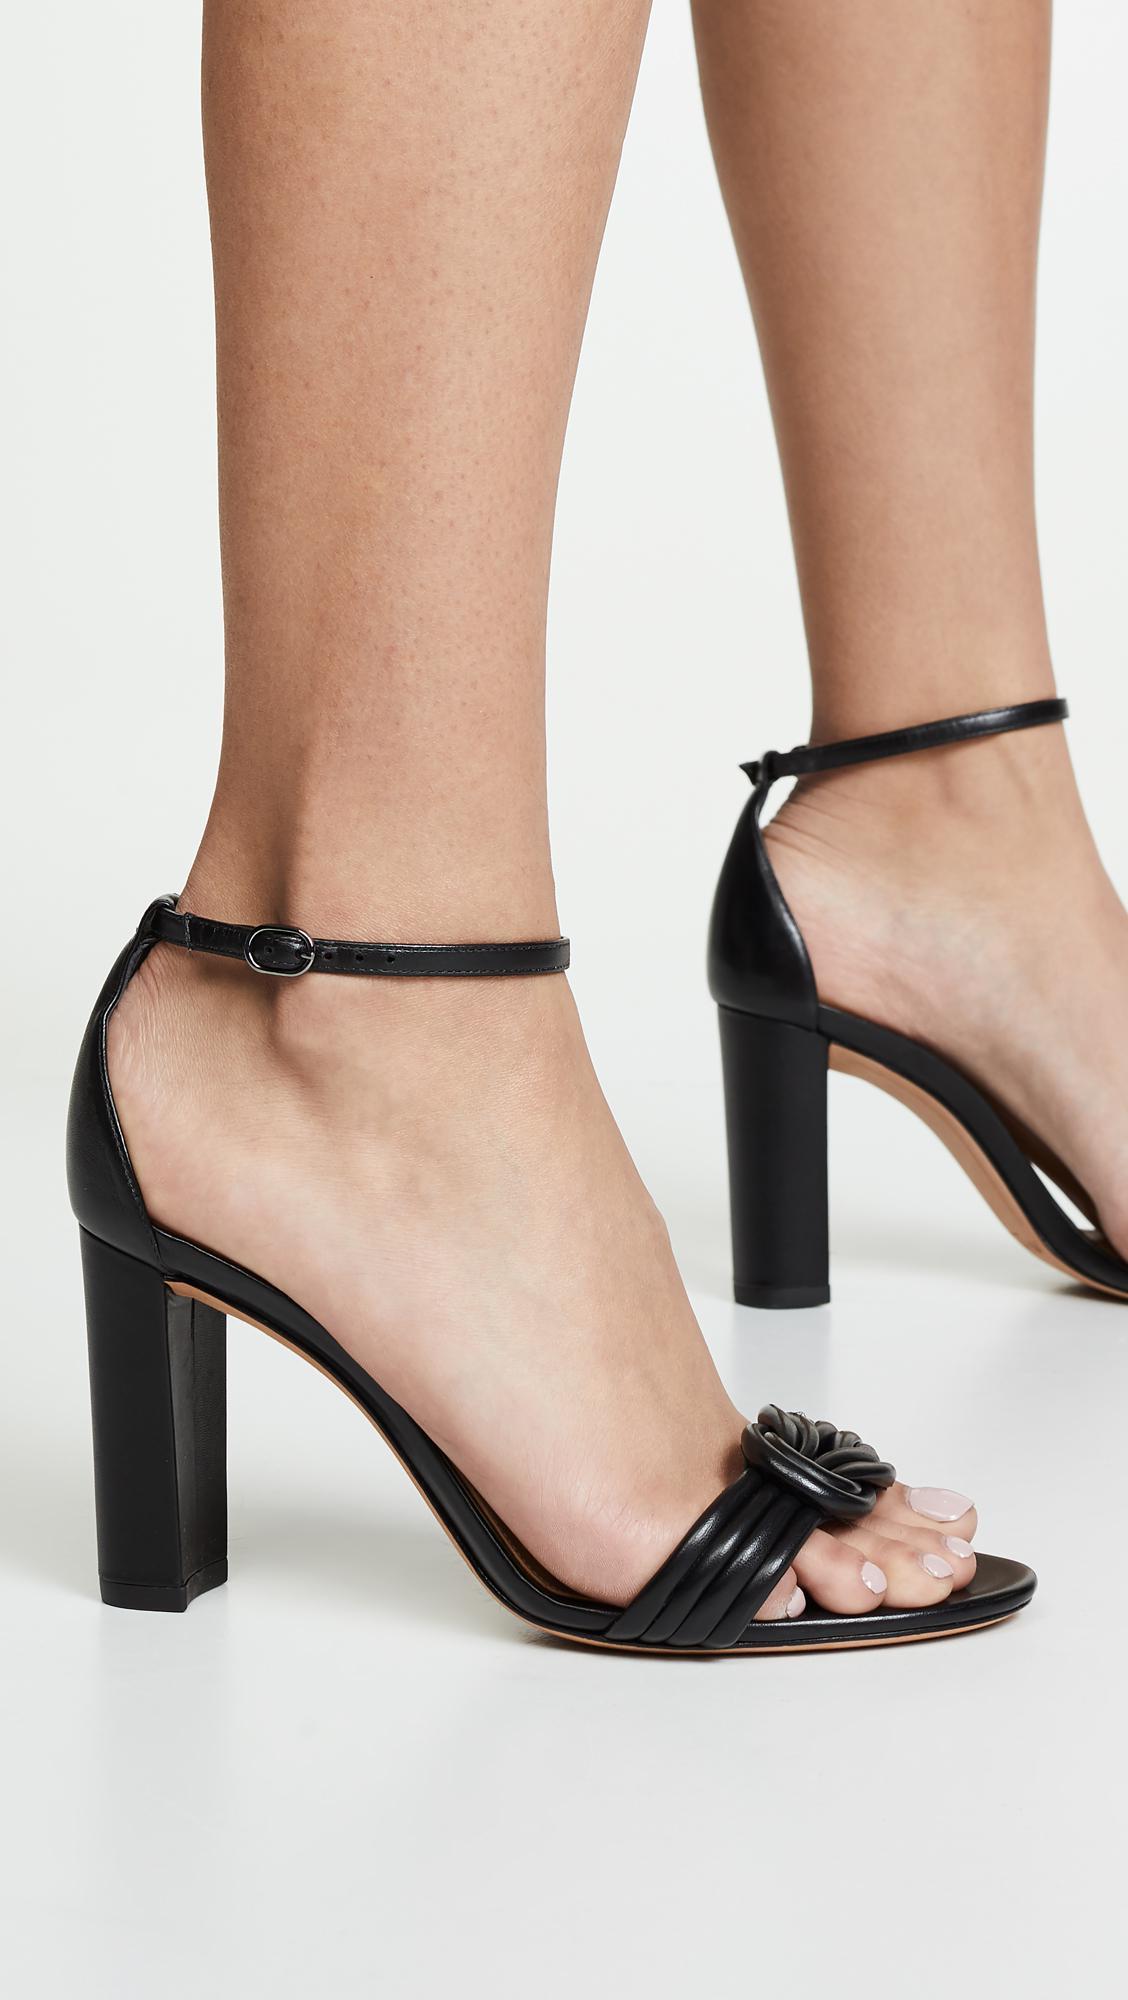 Chiara 90mm Block Sandals in Black